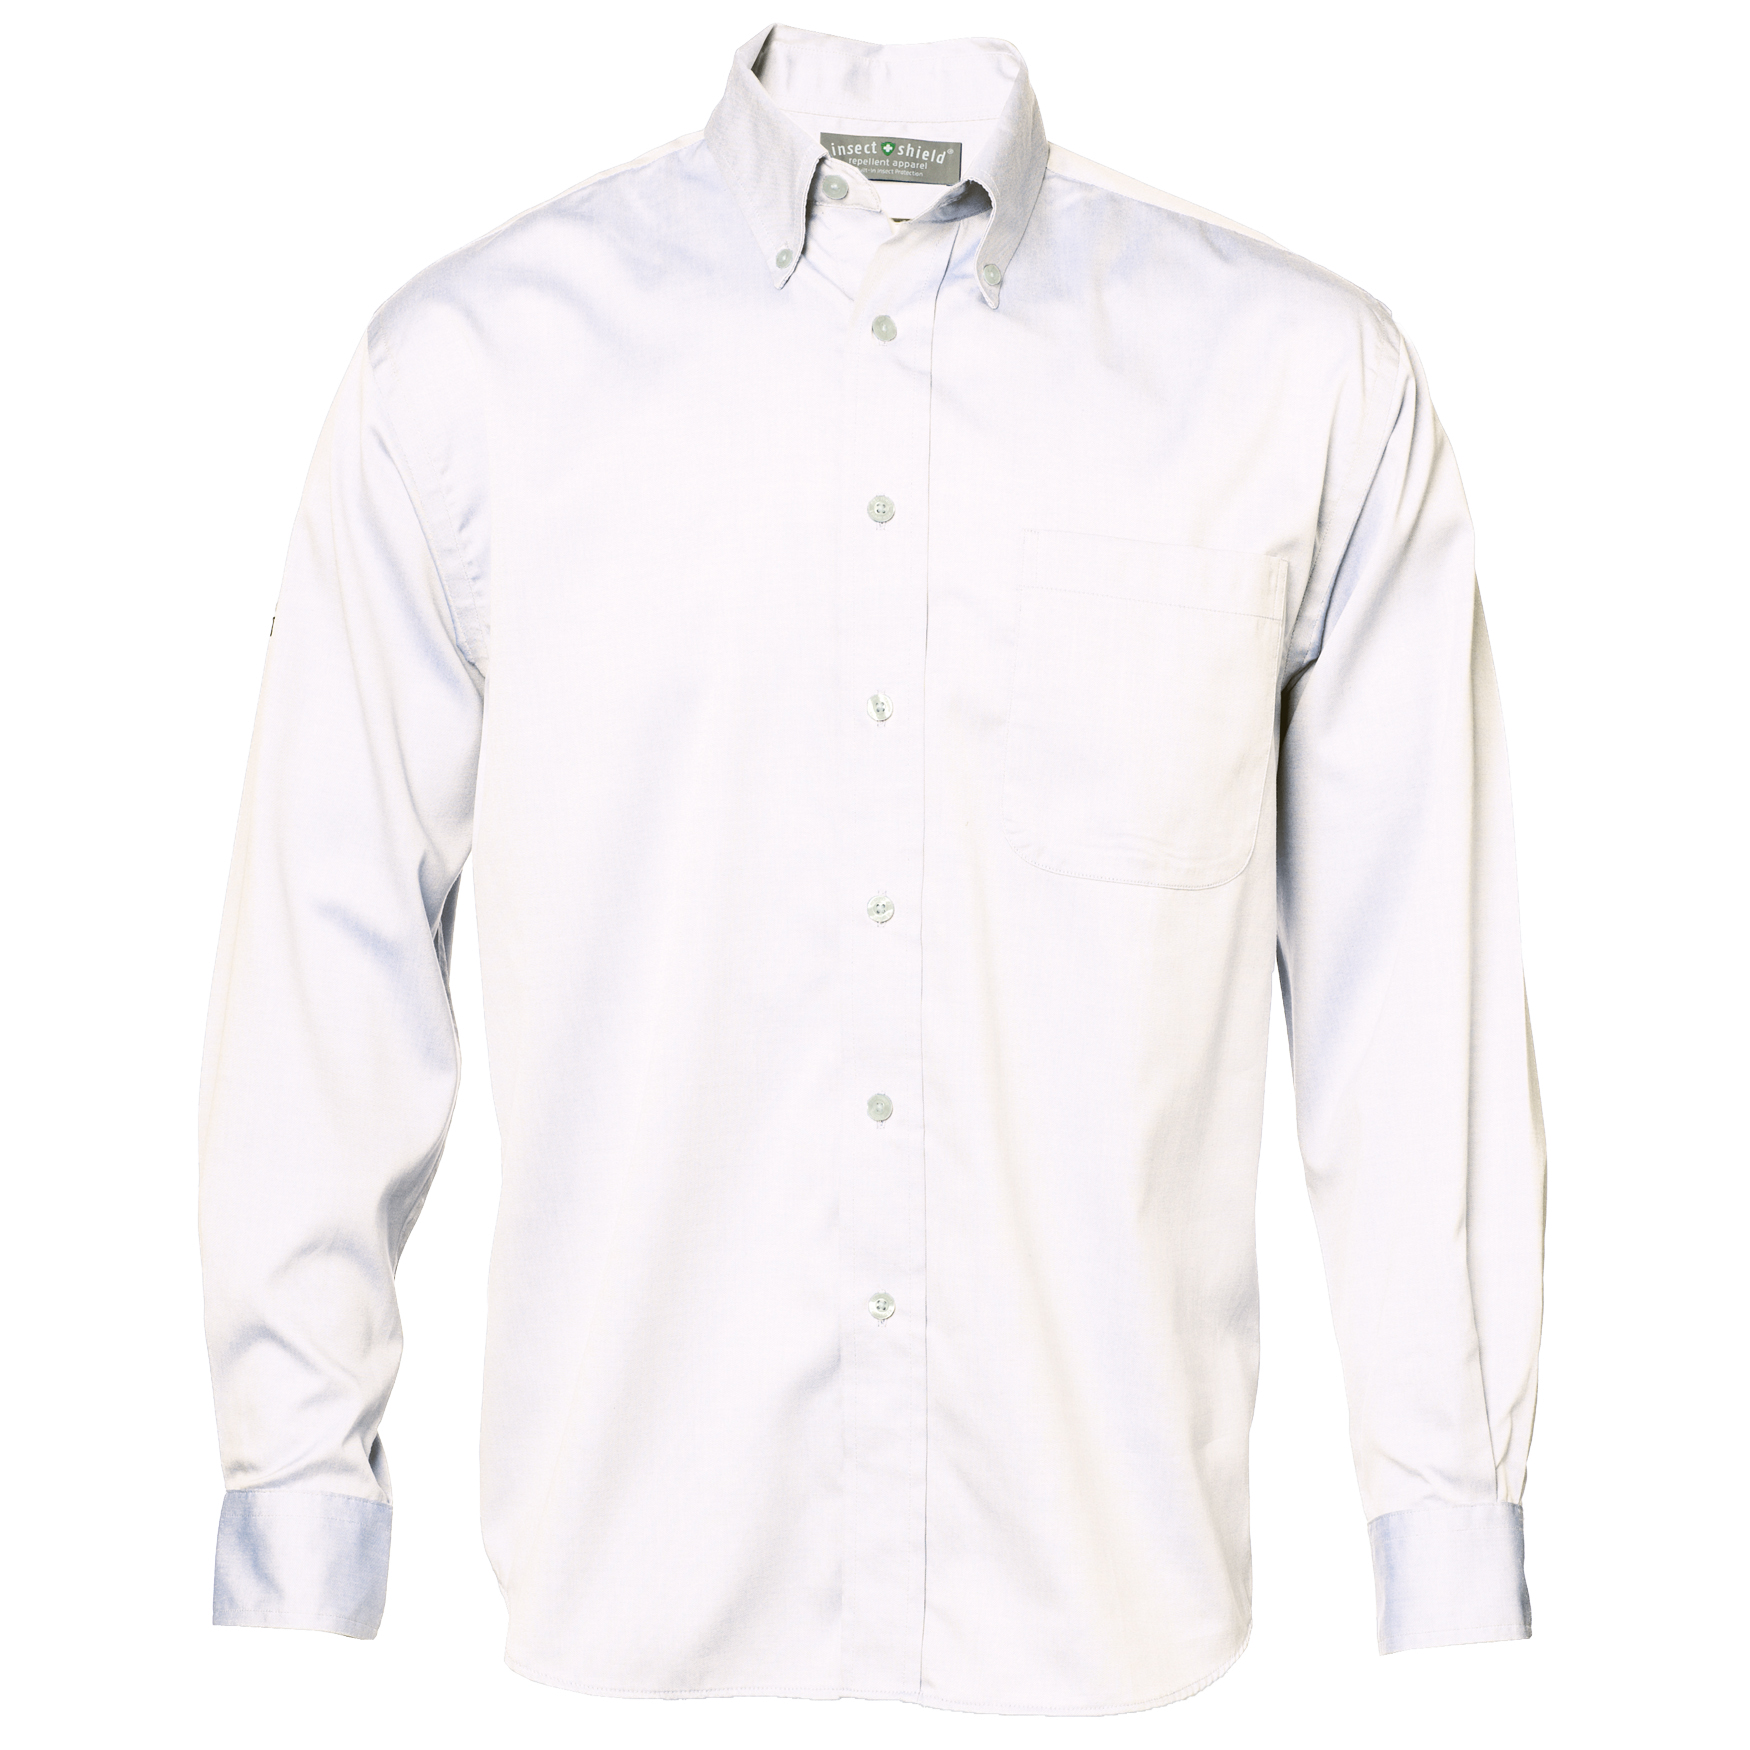 Men's Wrinkle Resistant Oxford Shirt